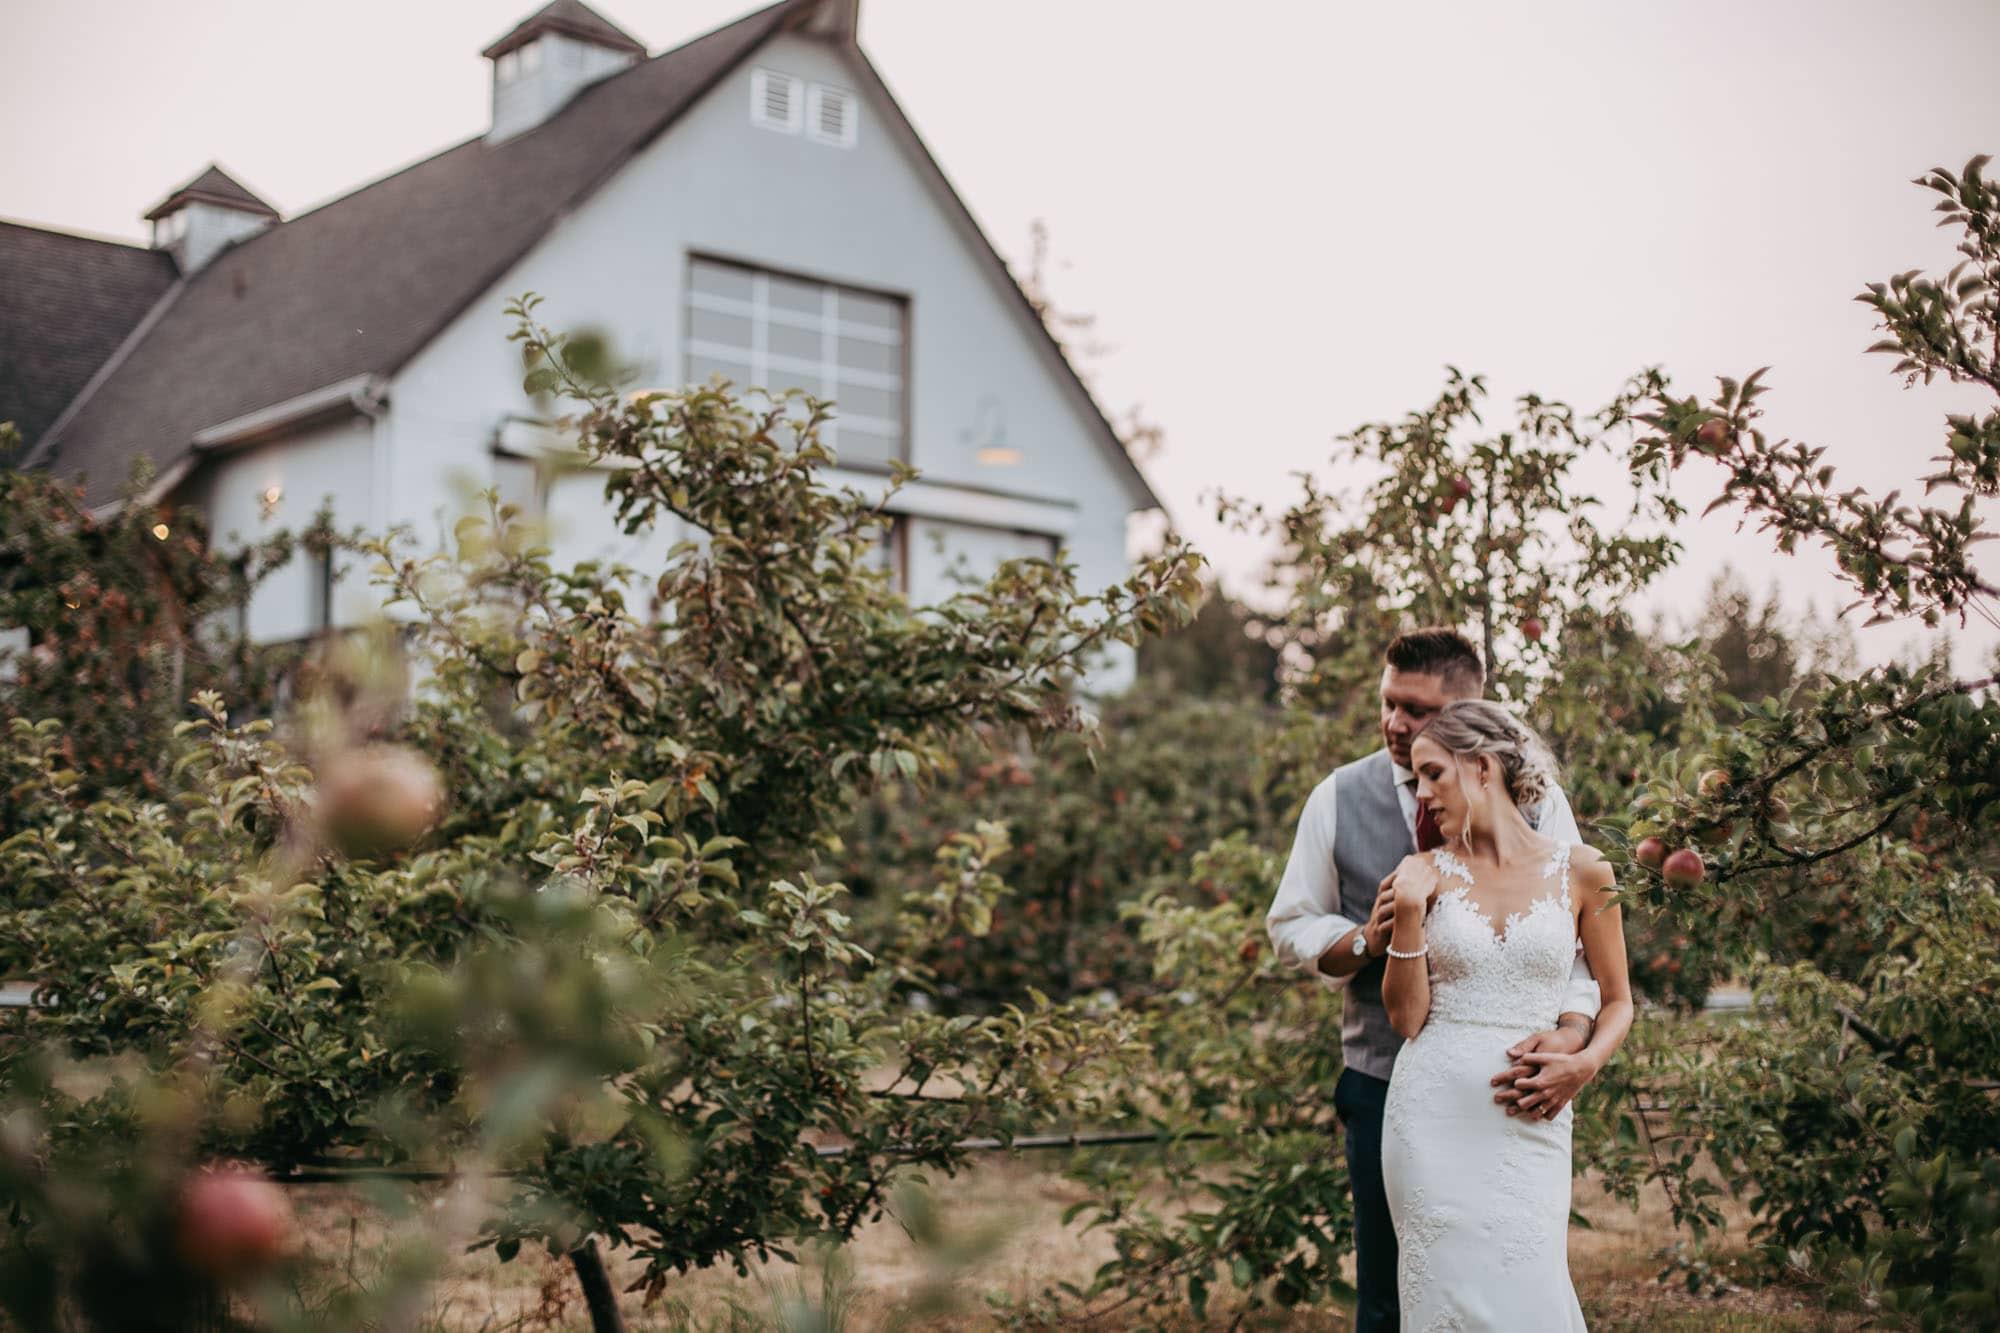 Sea Cider Farm & Ciderhouse wedding